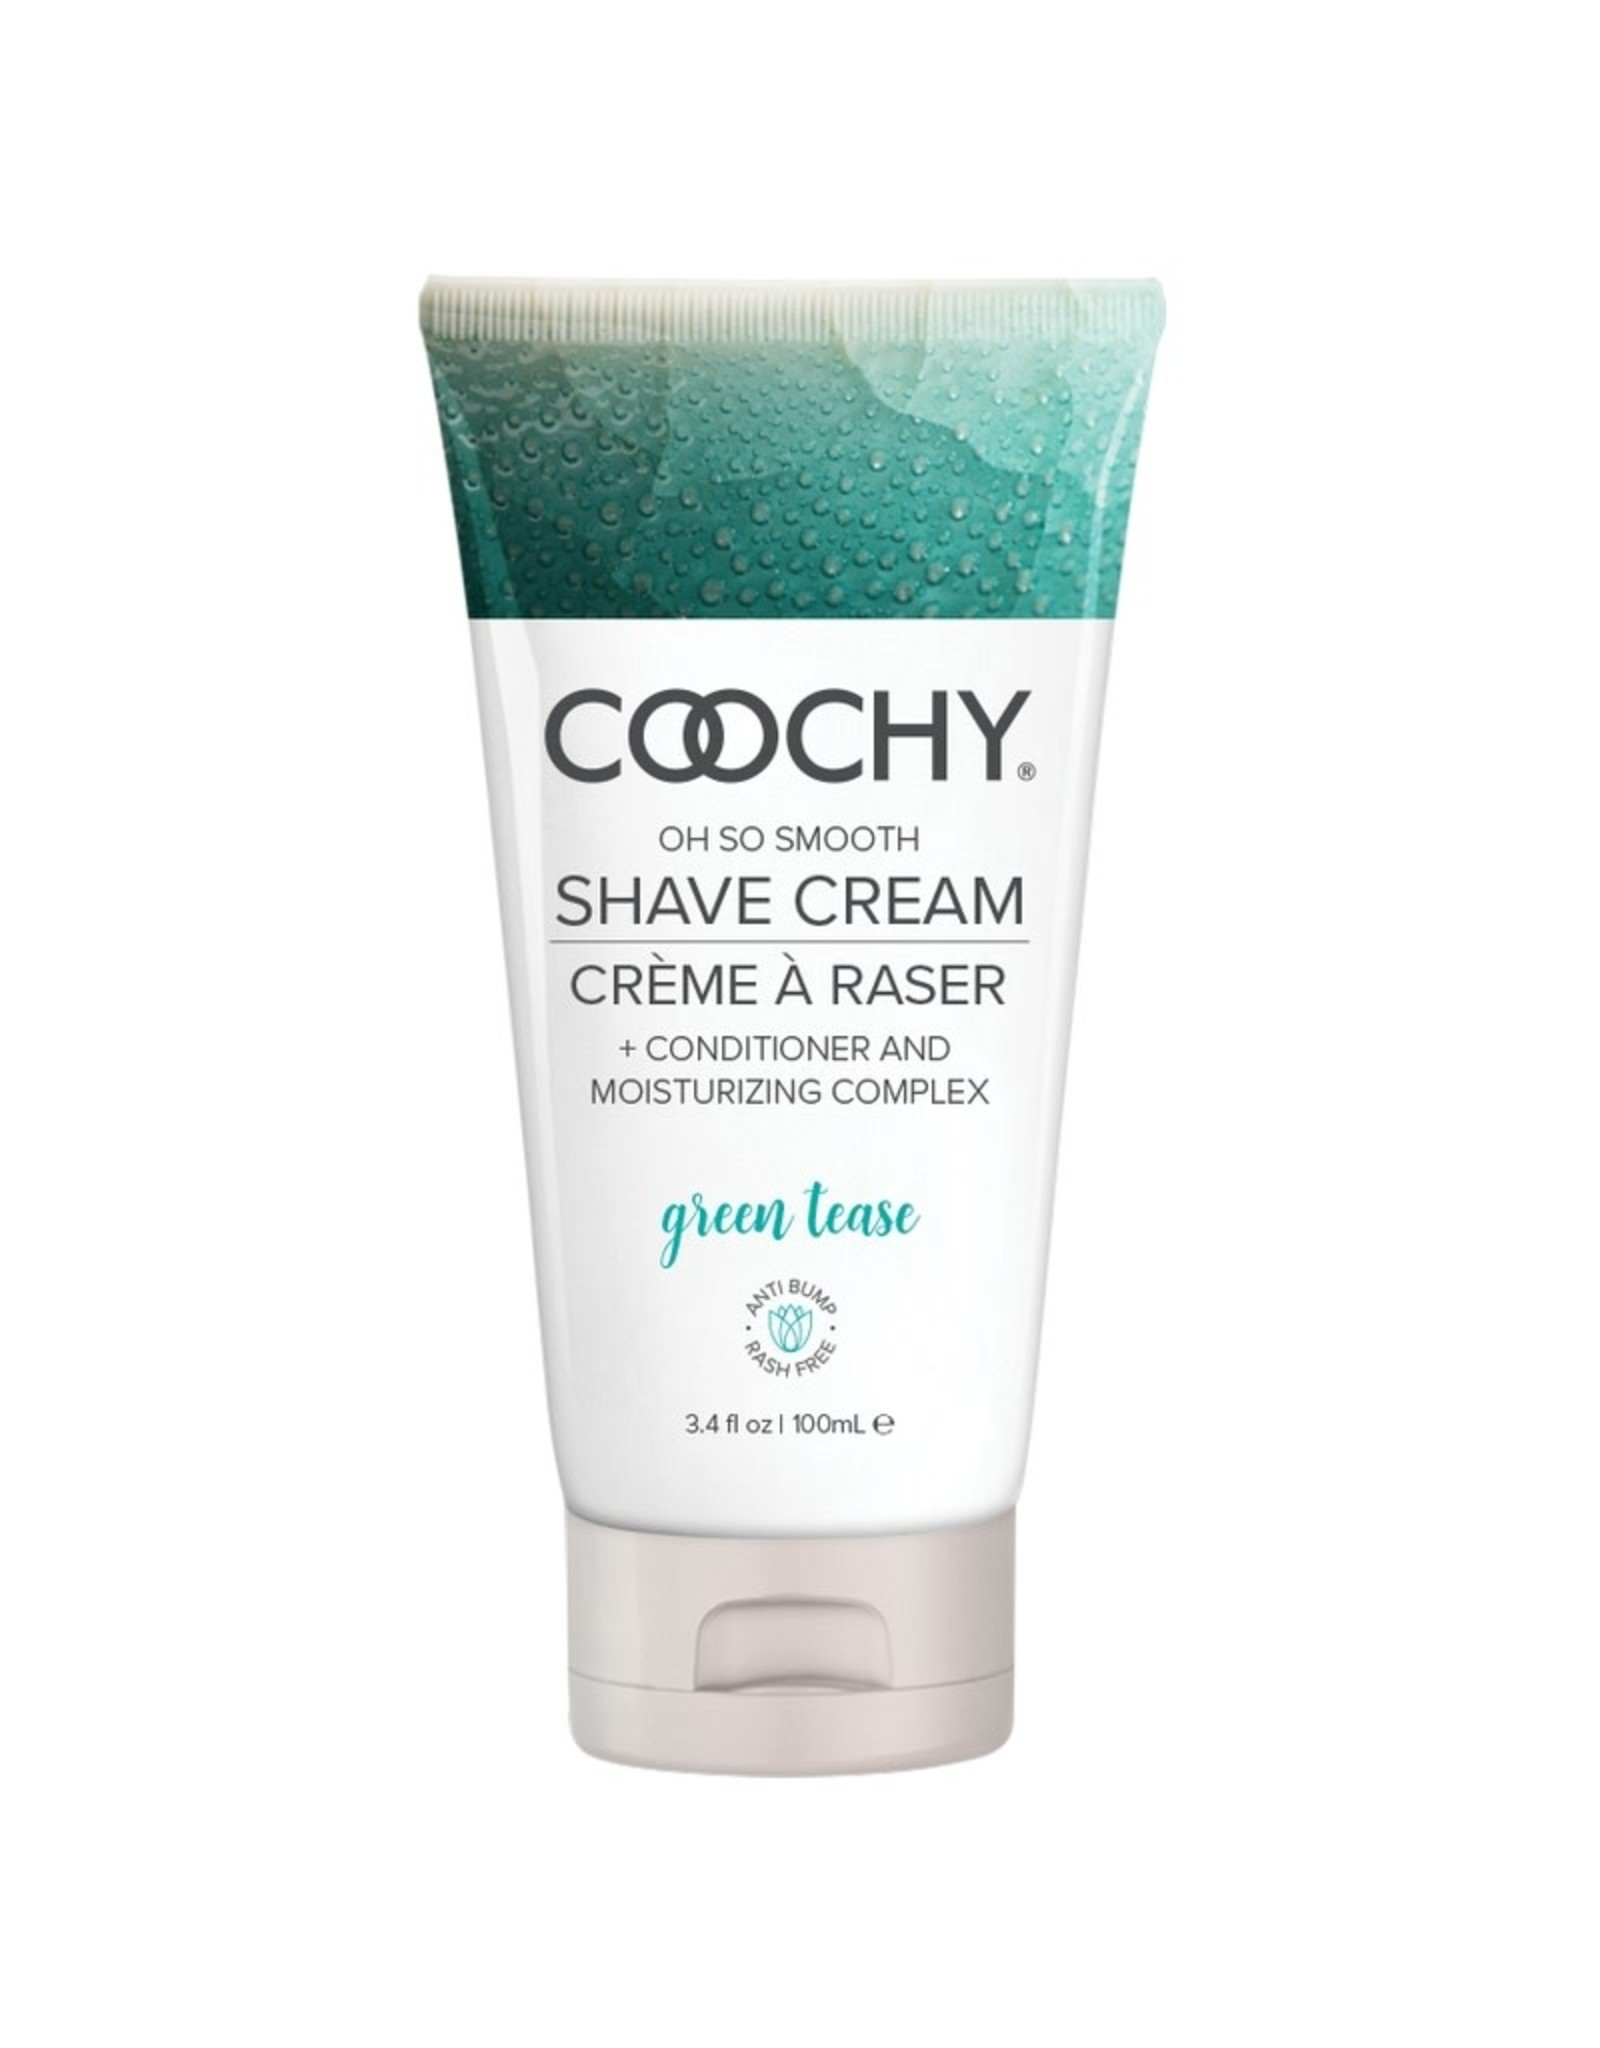 Coochy Coochy - Green Tease (3.4 oz)